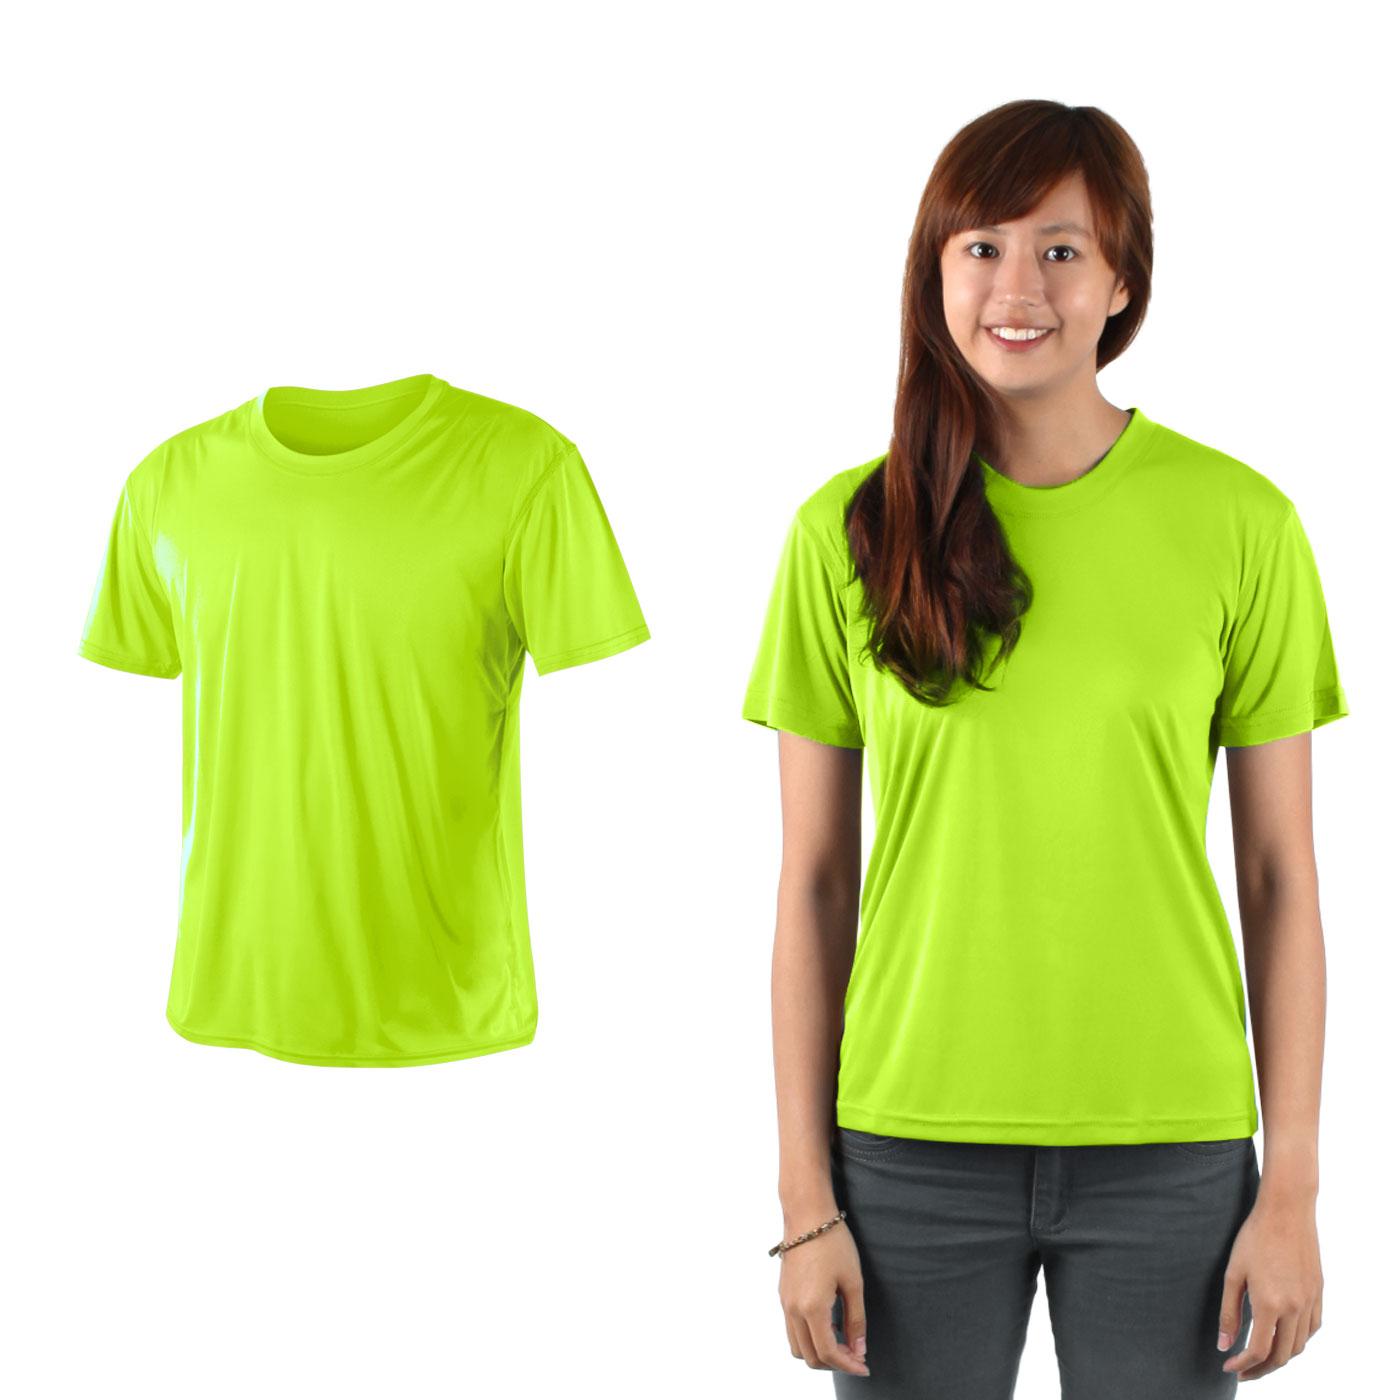 HODARLA 激膚無感衣3103901 - 螢光綠